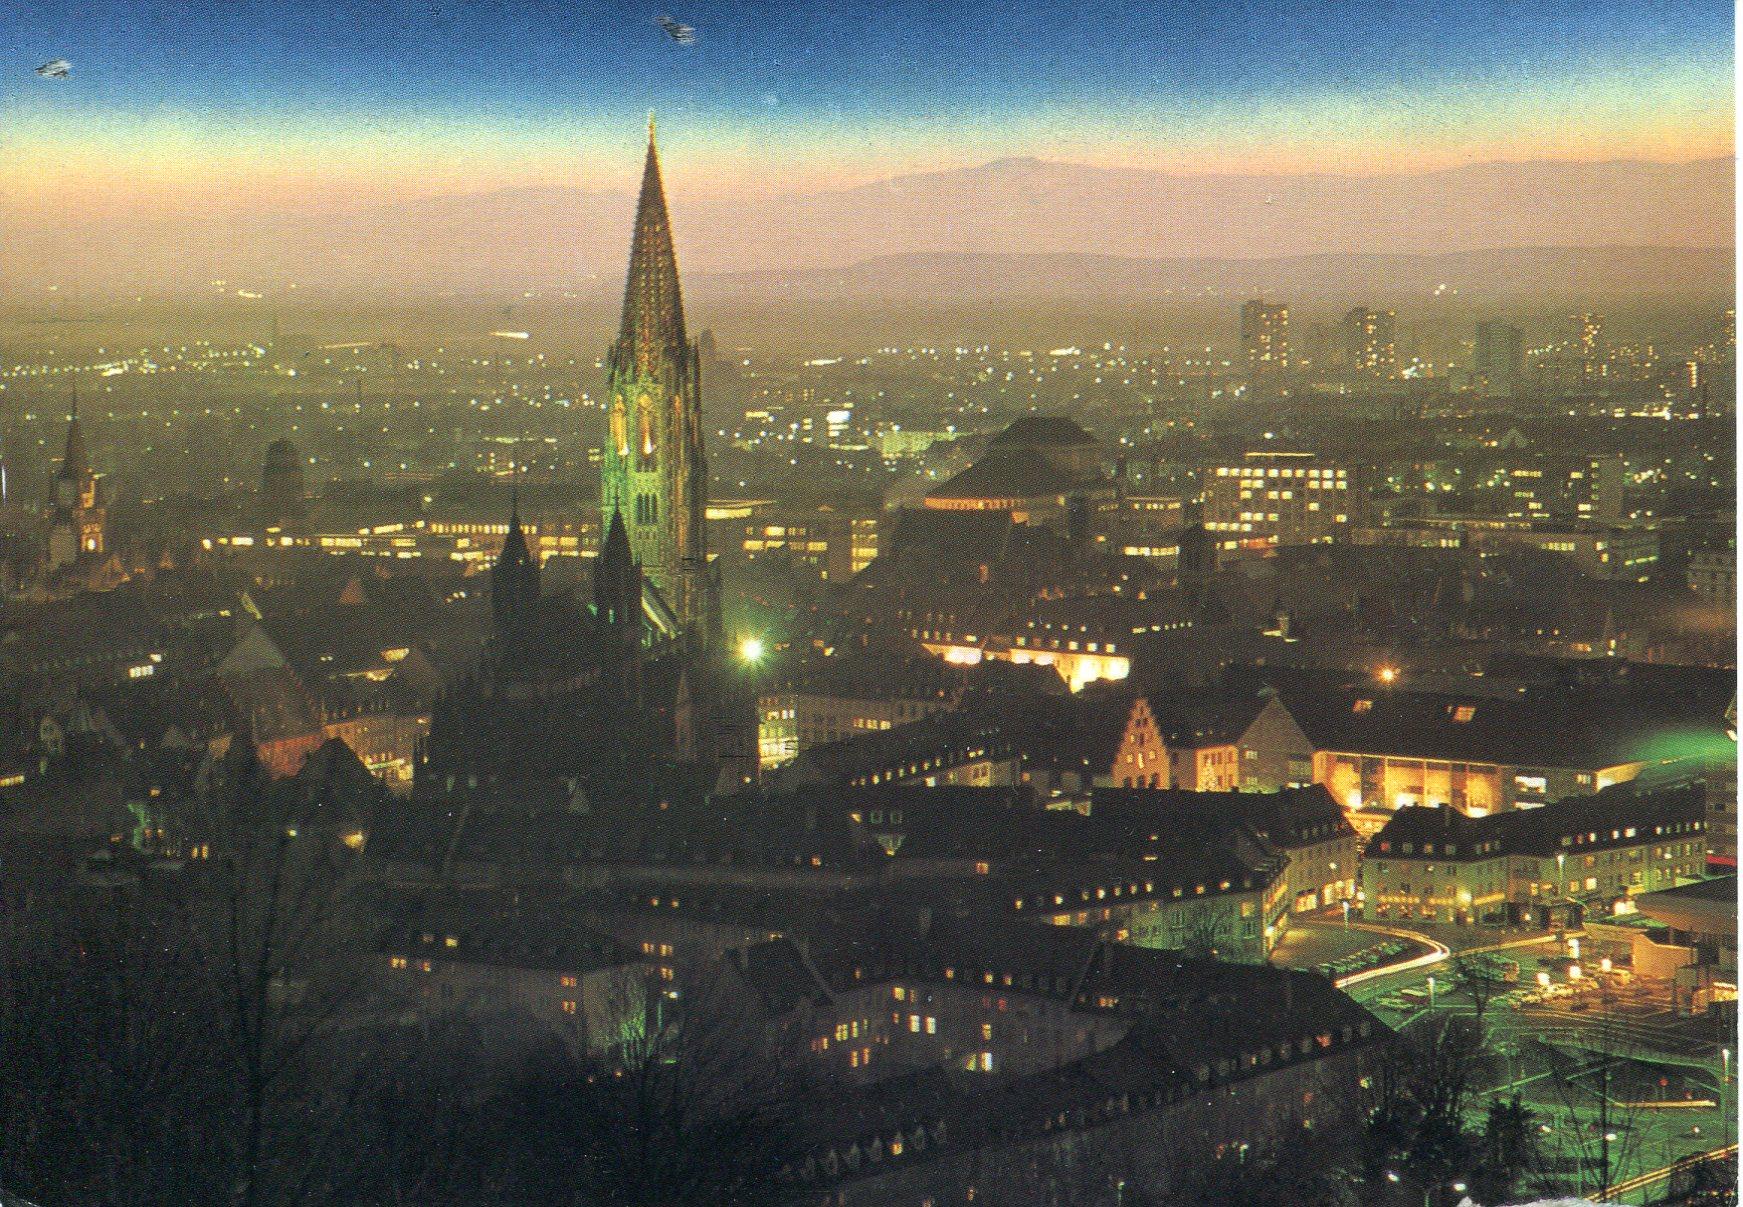 Freiburg im Breisgau Germany  city photo : Freiburg im Breisgau, Germany | Remembering Letters and Postcards